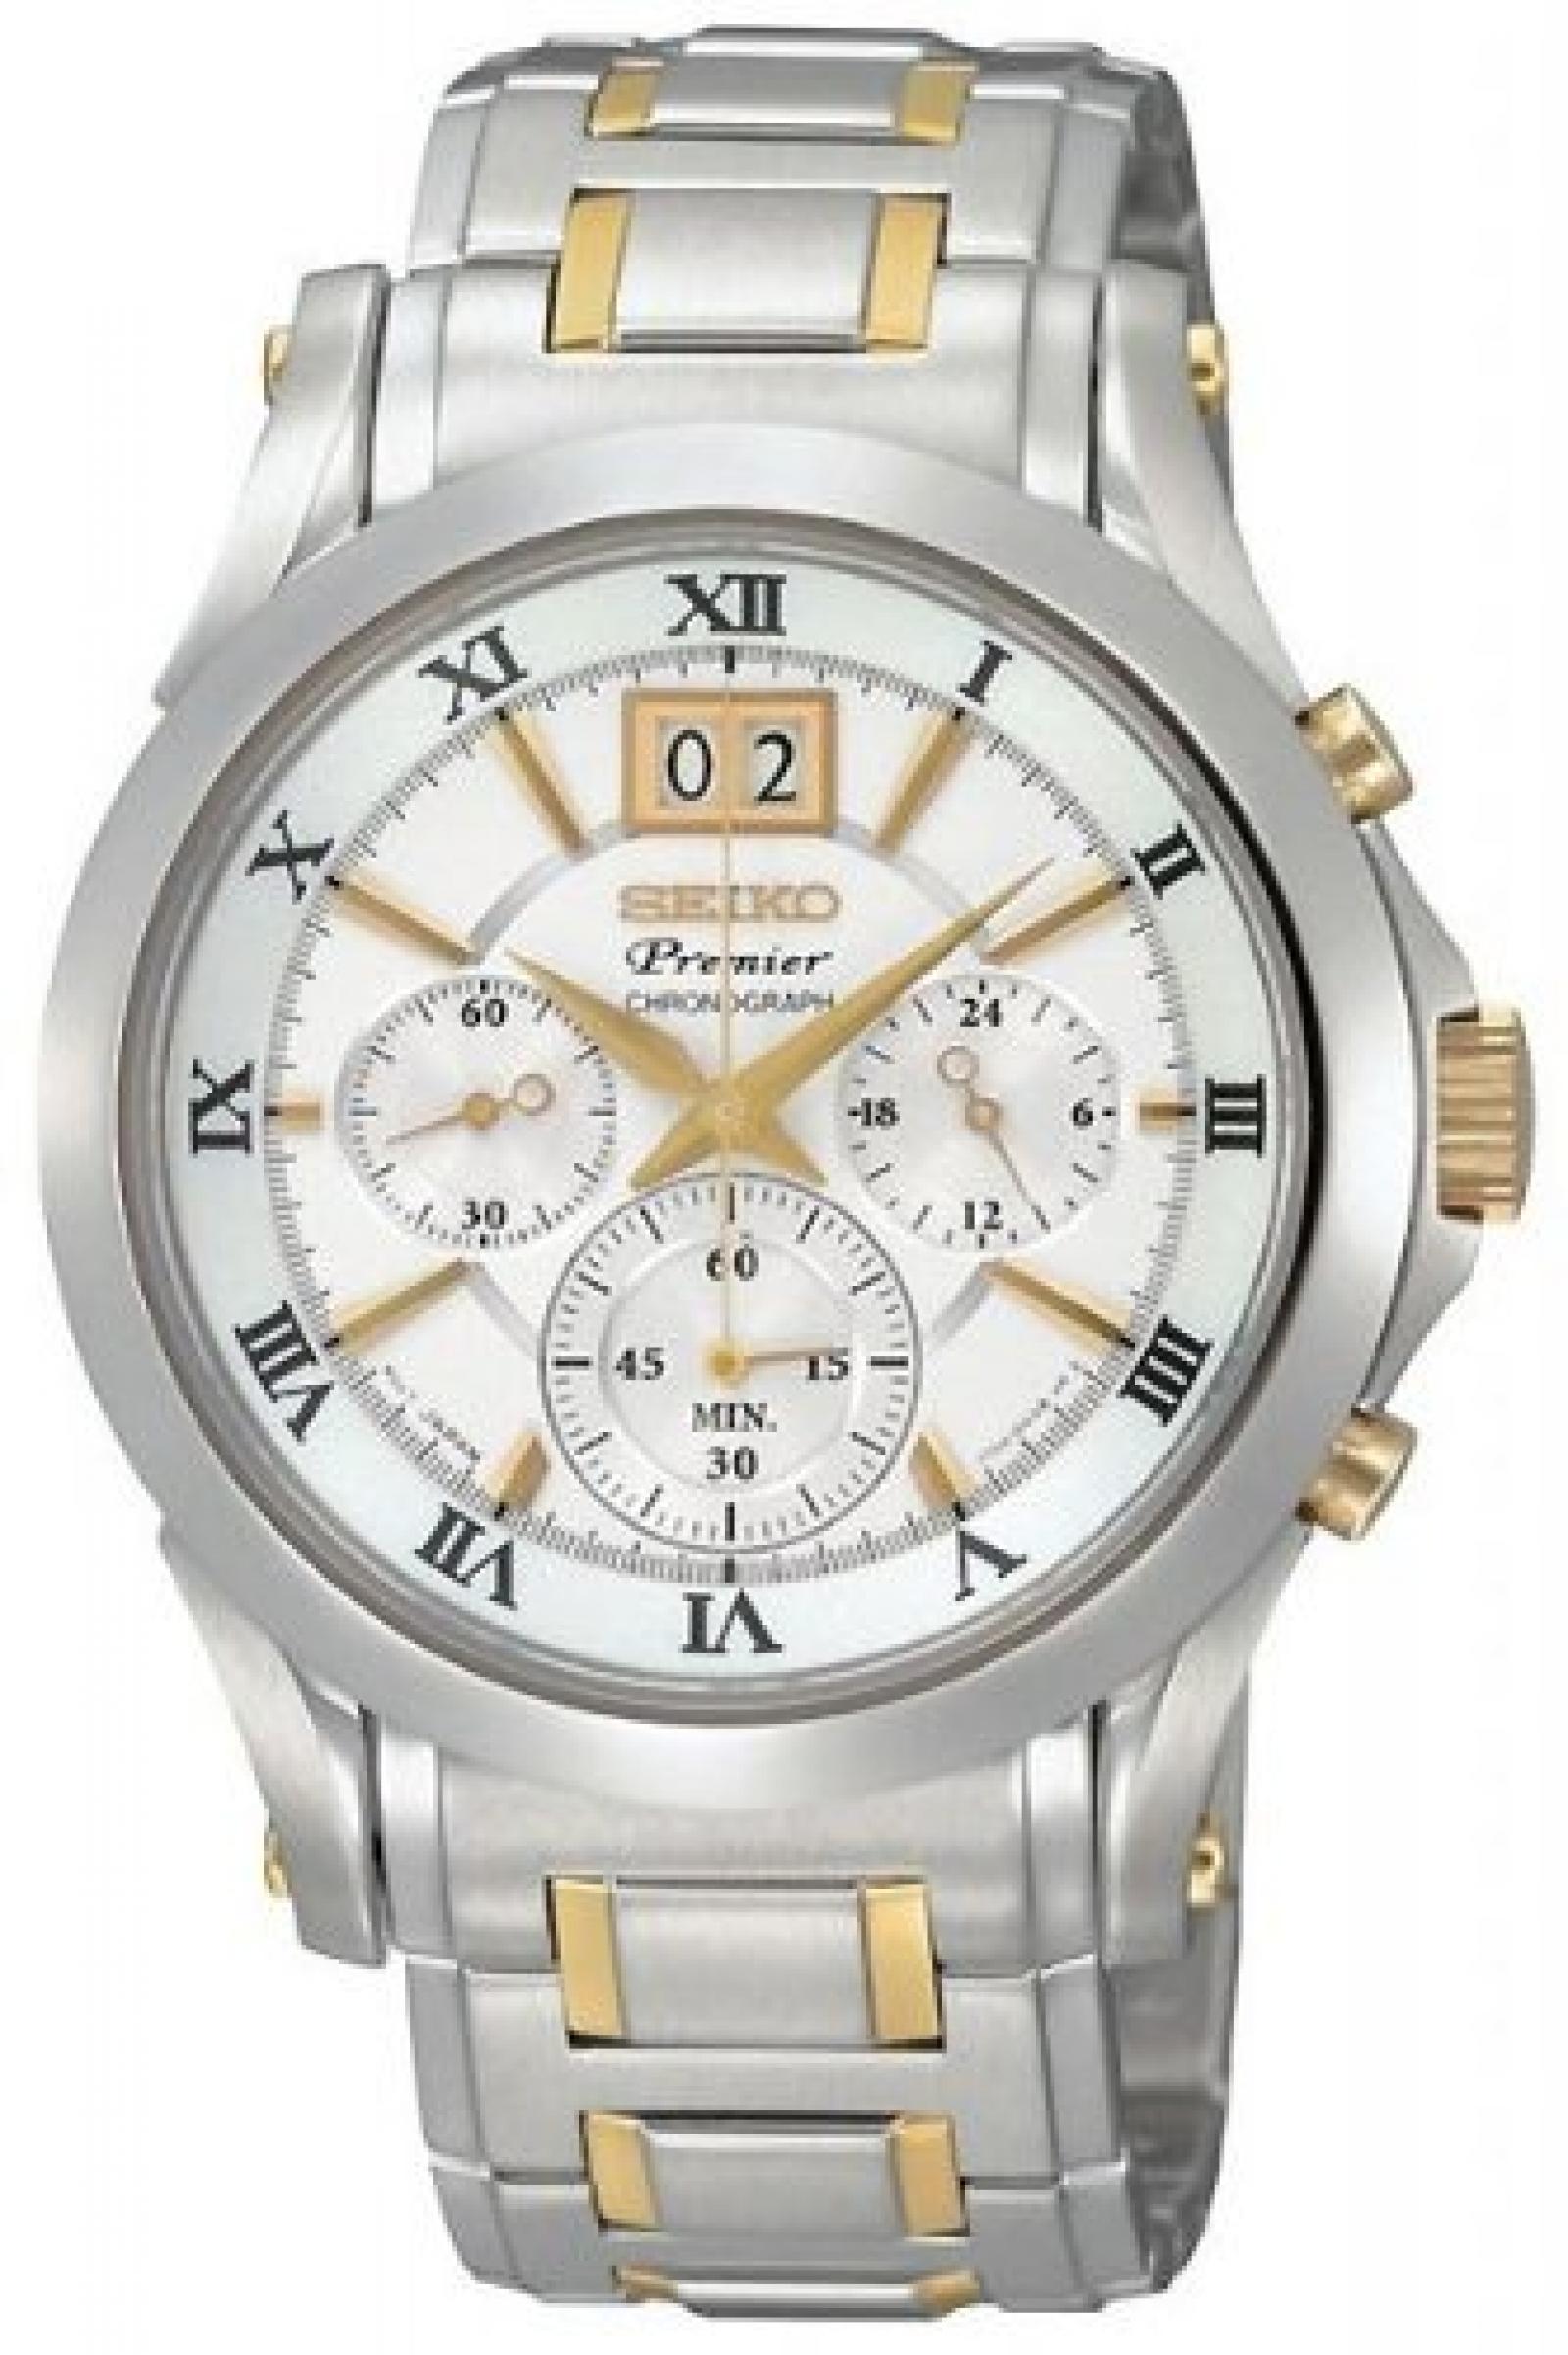 Seiko Mens Premier Chronograph White Dial Bracelet Watch - SPC058P1